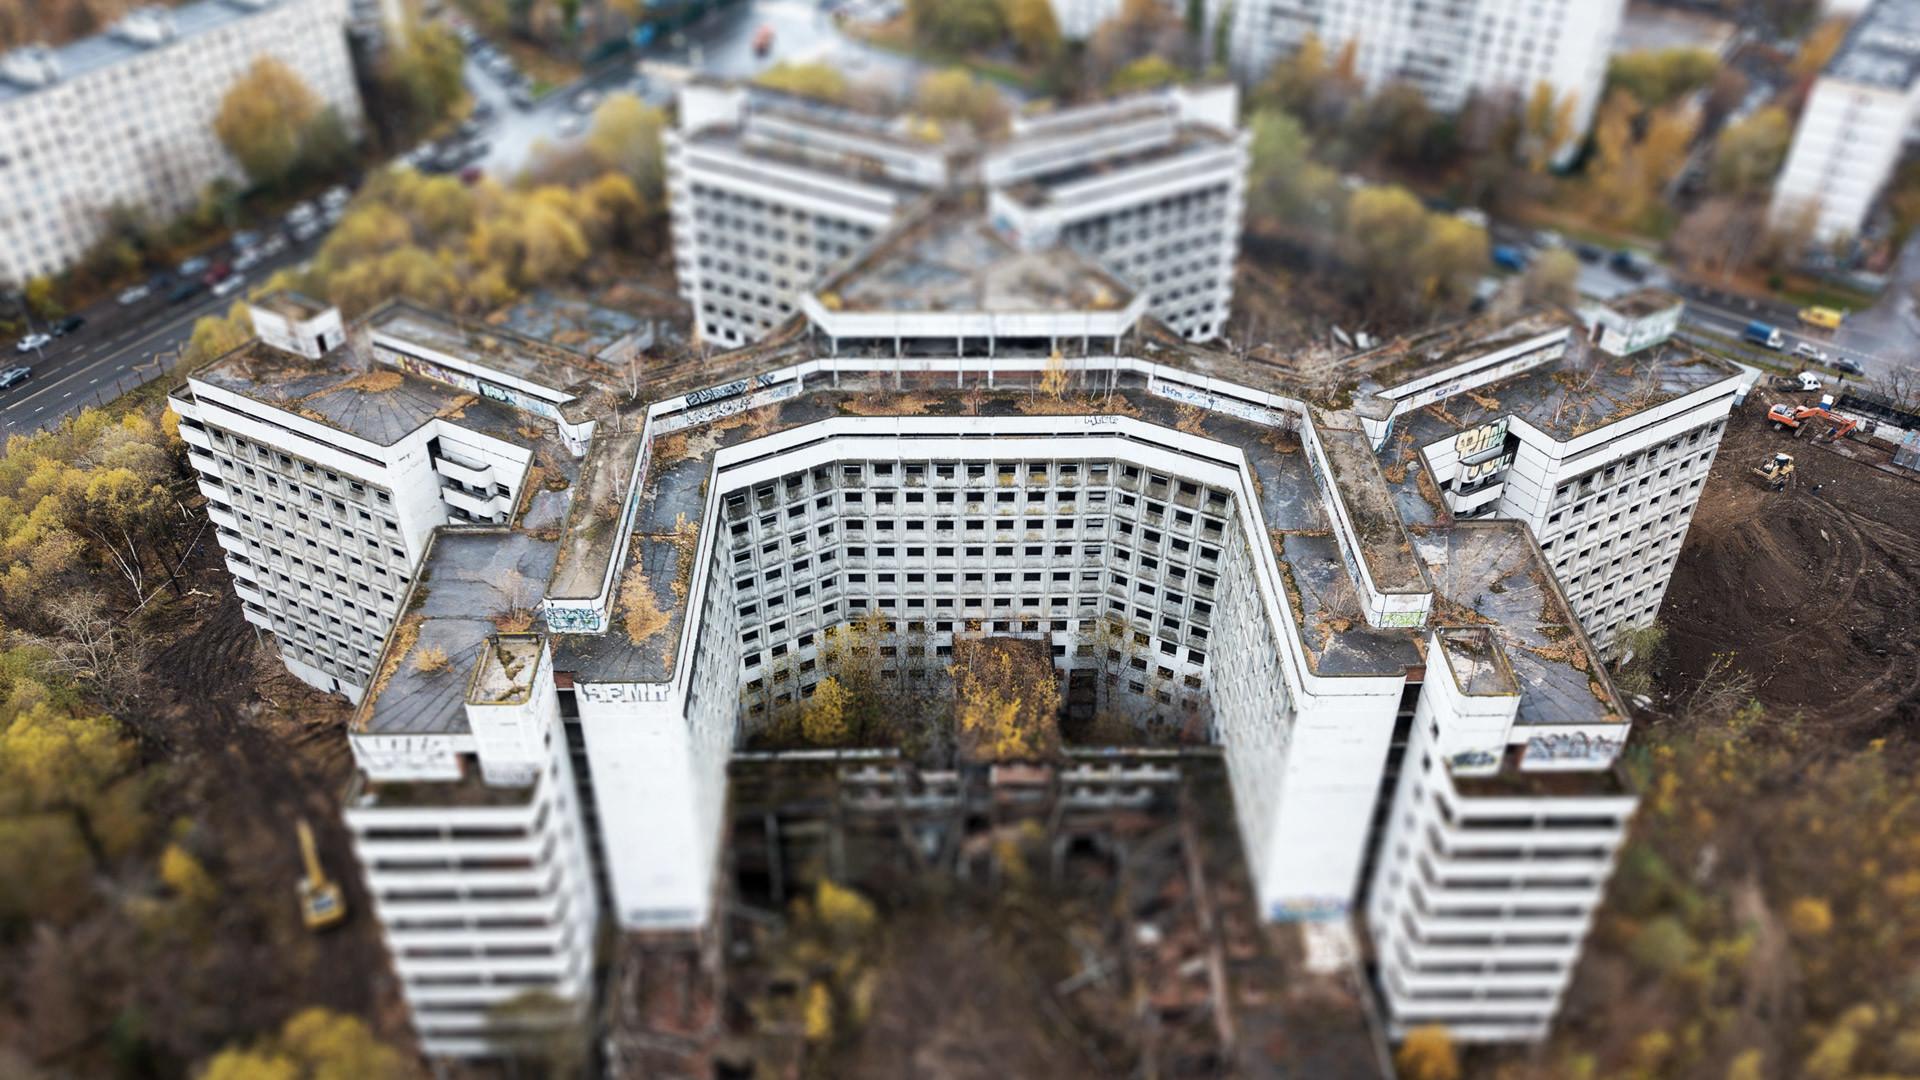 <p>Фото: &copy;&nbsp;РИА Новости/Илья Питалев</p>